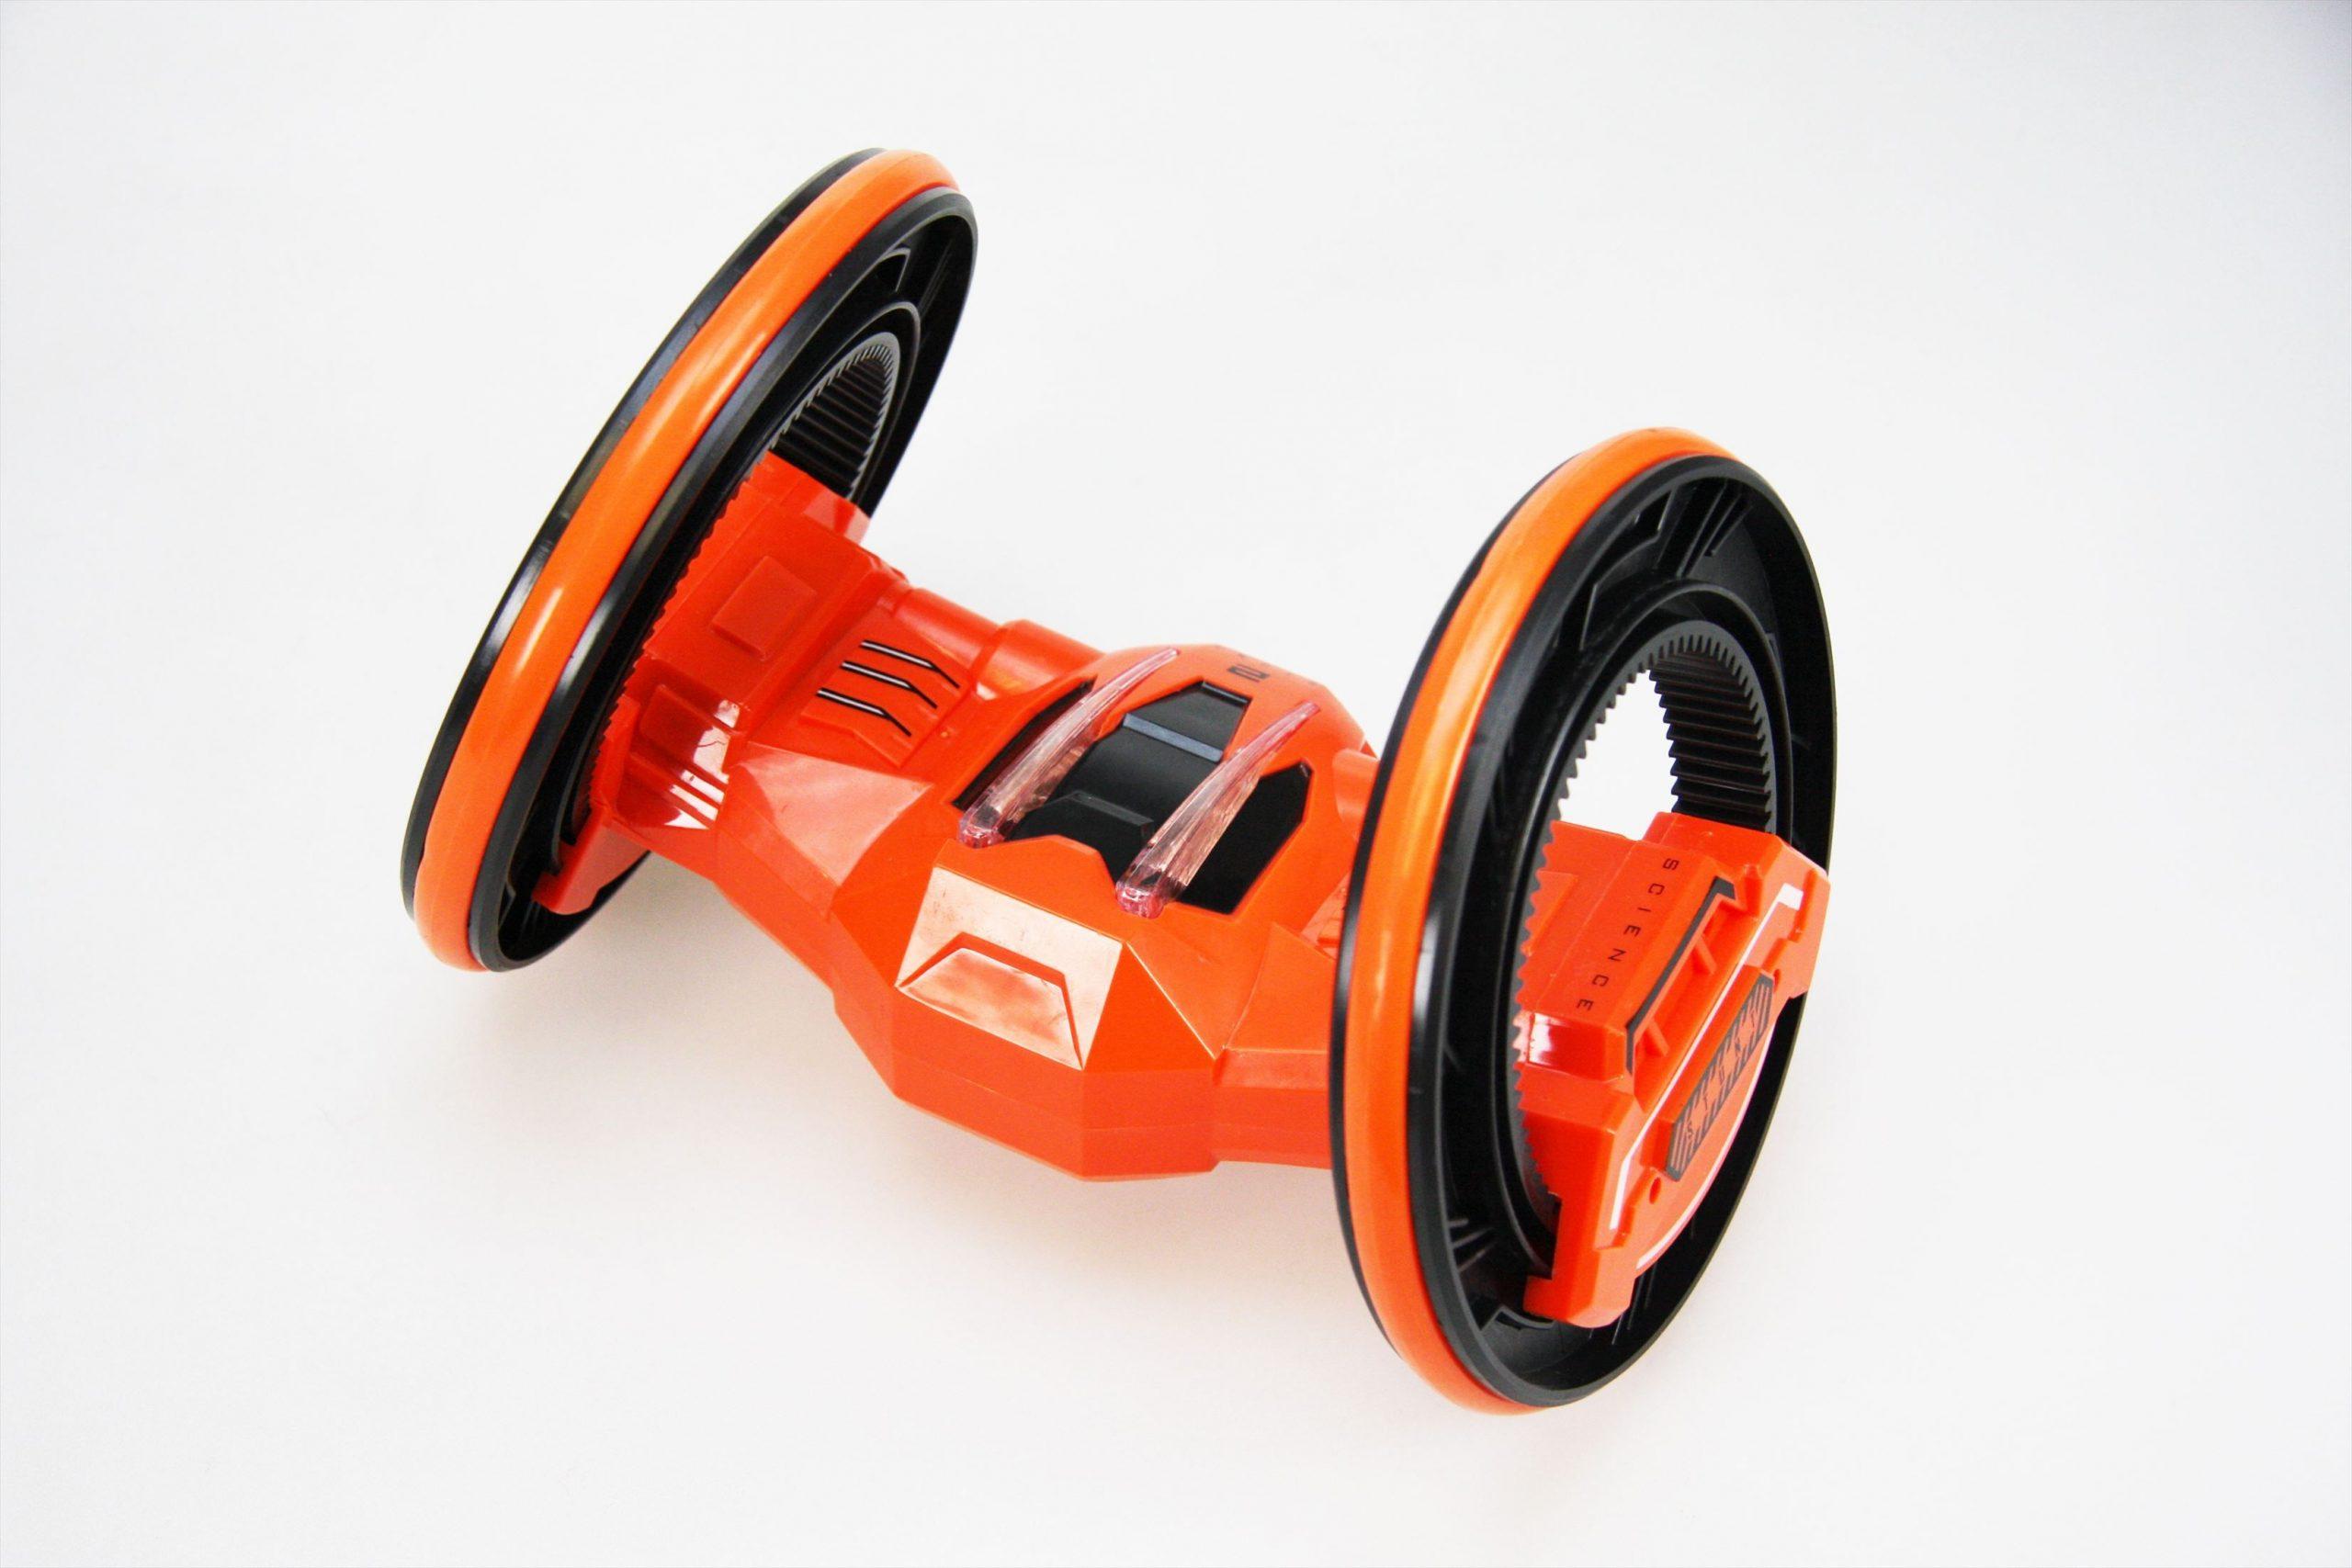 6 Channel Remote Control Stunt Car